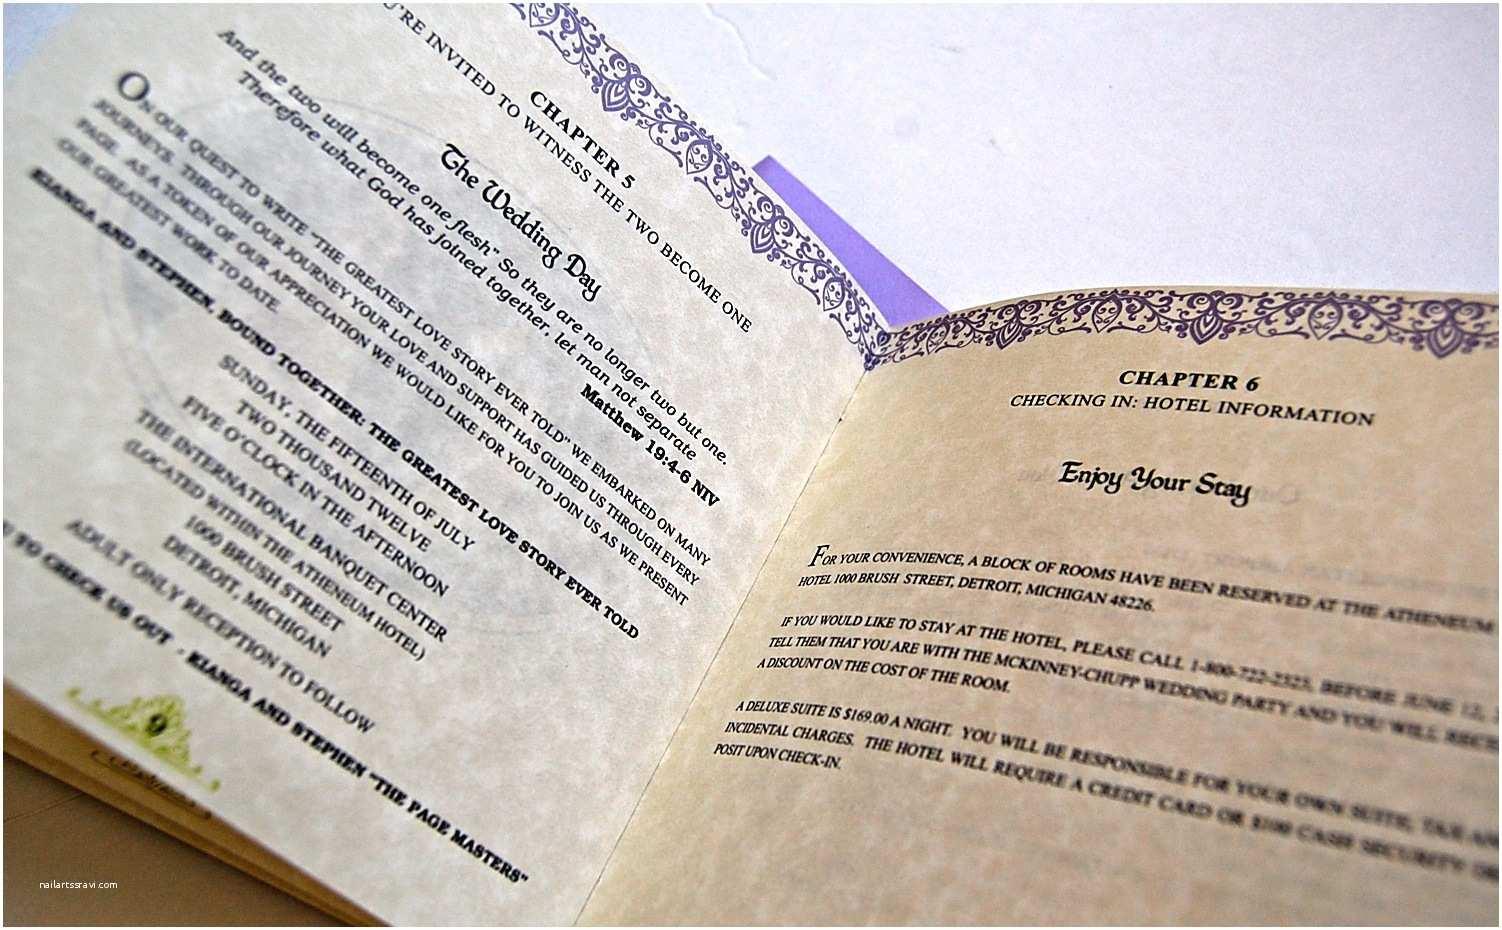 Literary themed Wedding Invitations Vintage Book Style Invitations for A Literary themed